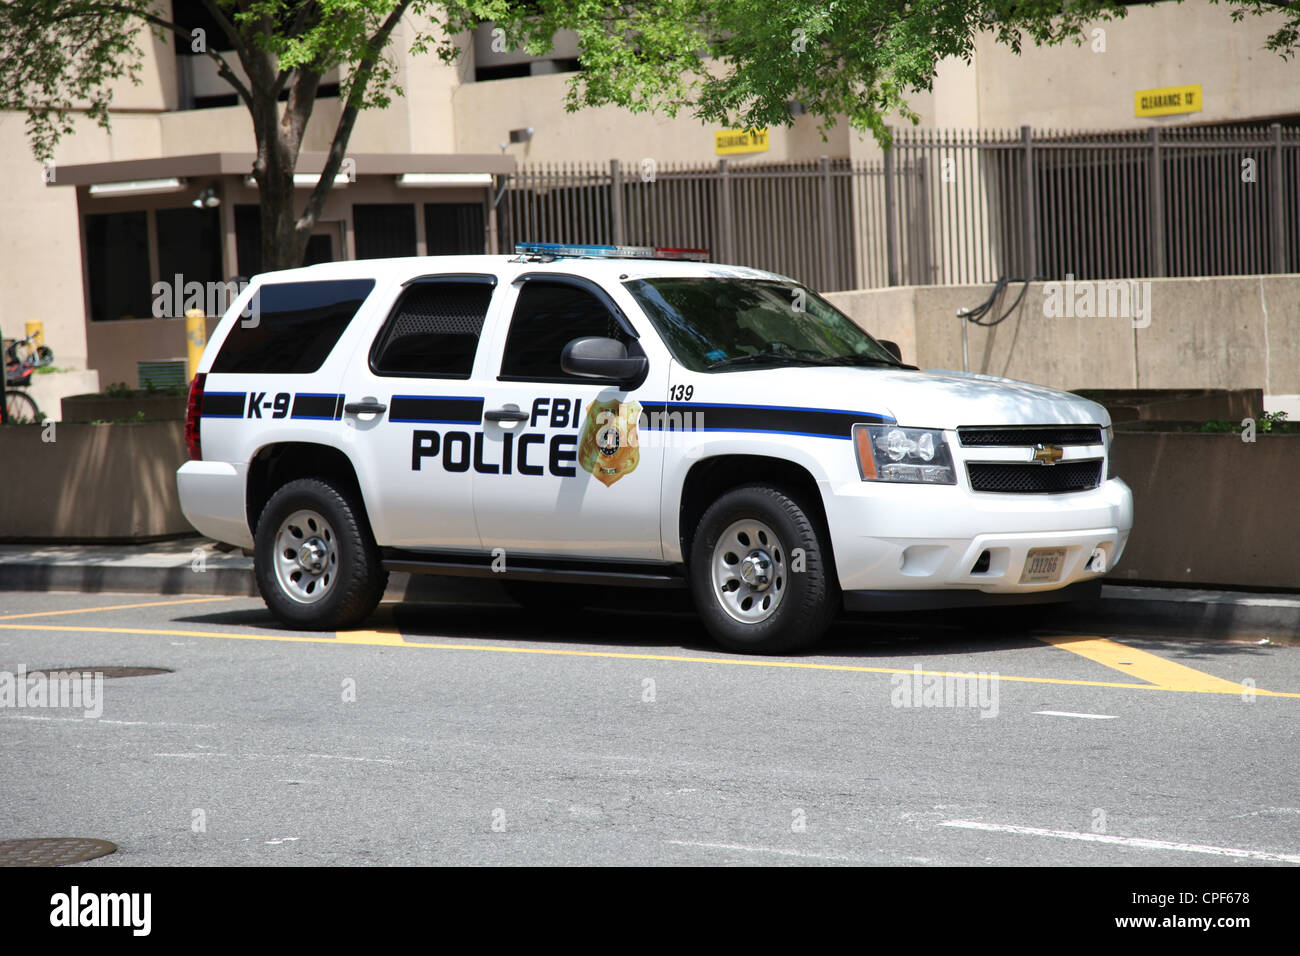 FBI Police Car Outside J.Edgar Hoover Building in Washington D.C. Stock Photo